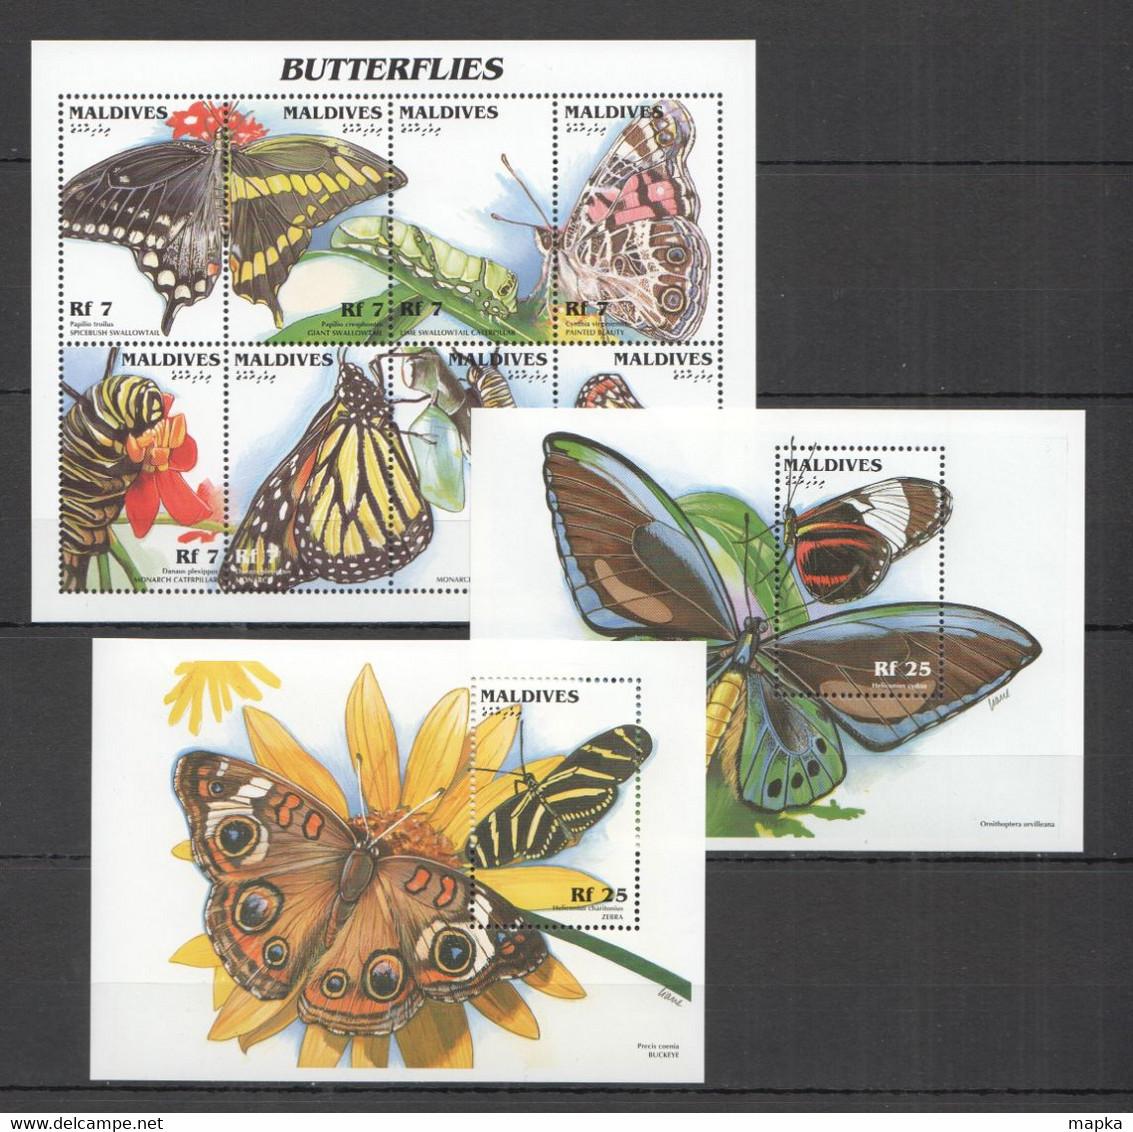 XX713 MALDIVES BUTTERFLIES INSECTS & FLOWERS FLORA & FAUNA !!! 1KB+2BL MNH - Mariposas